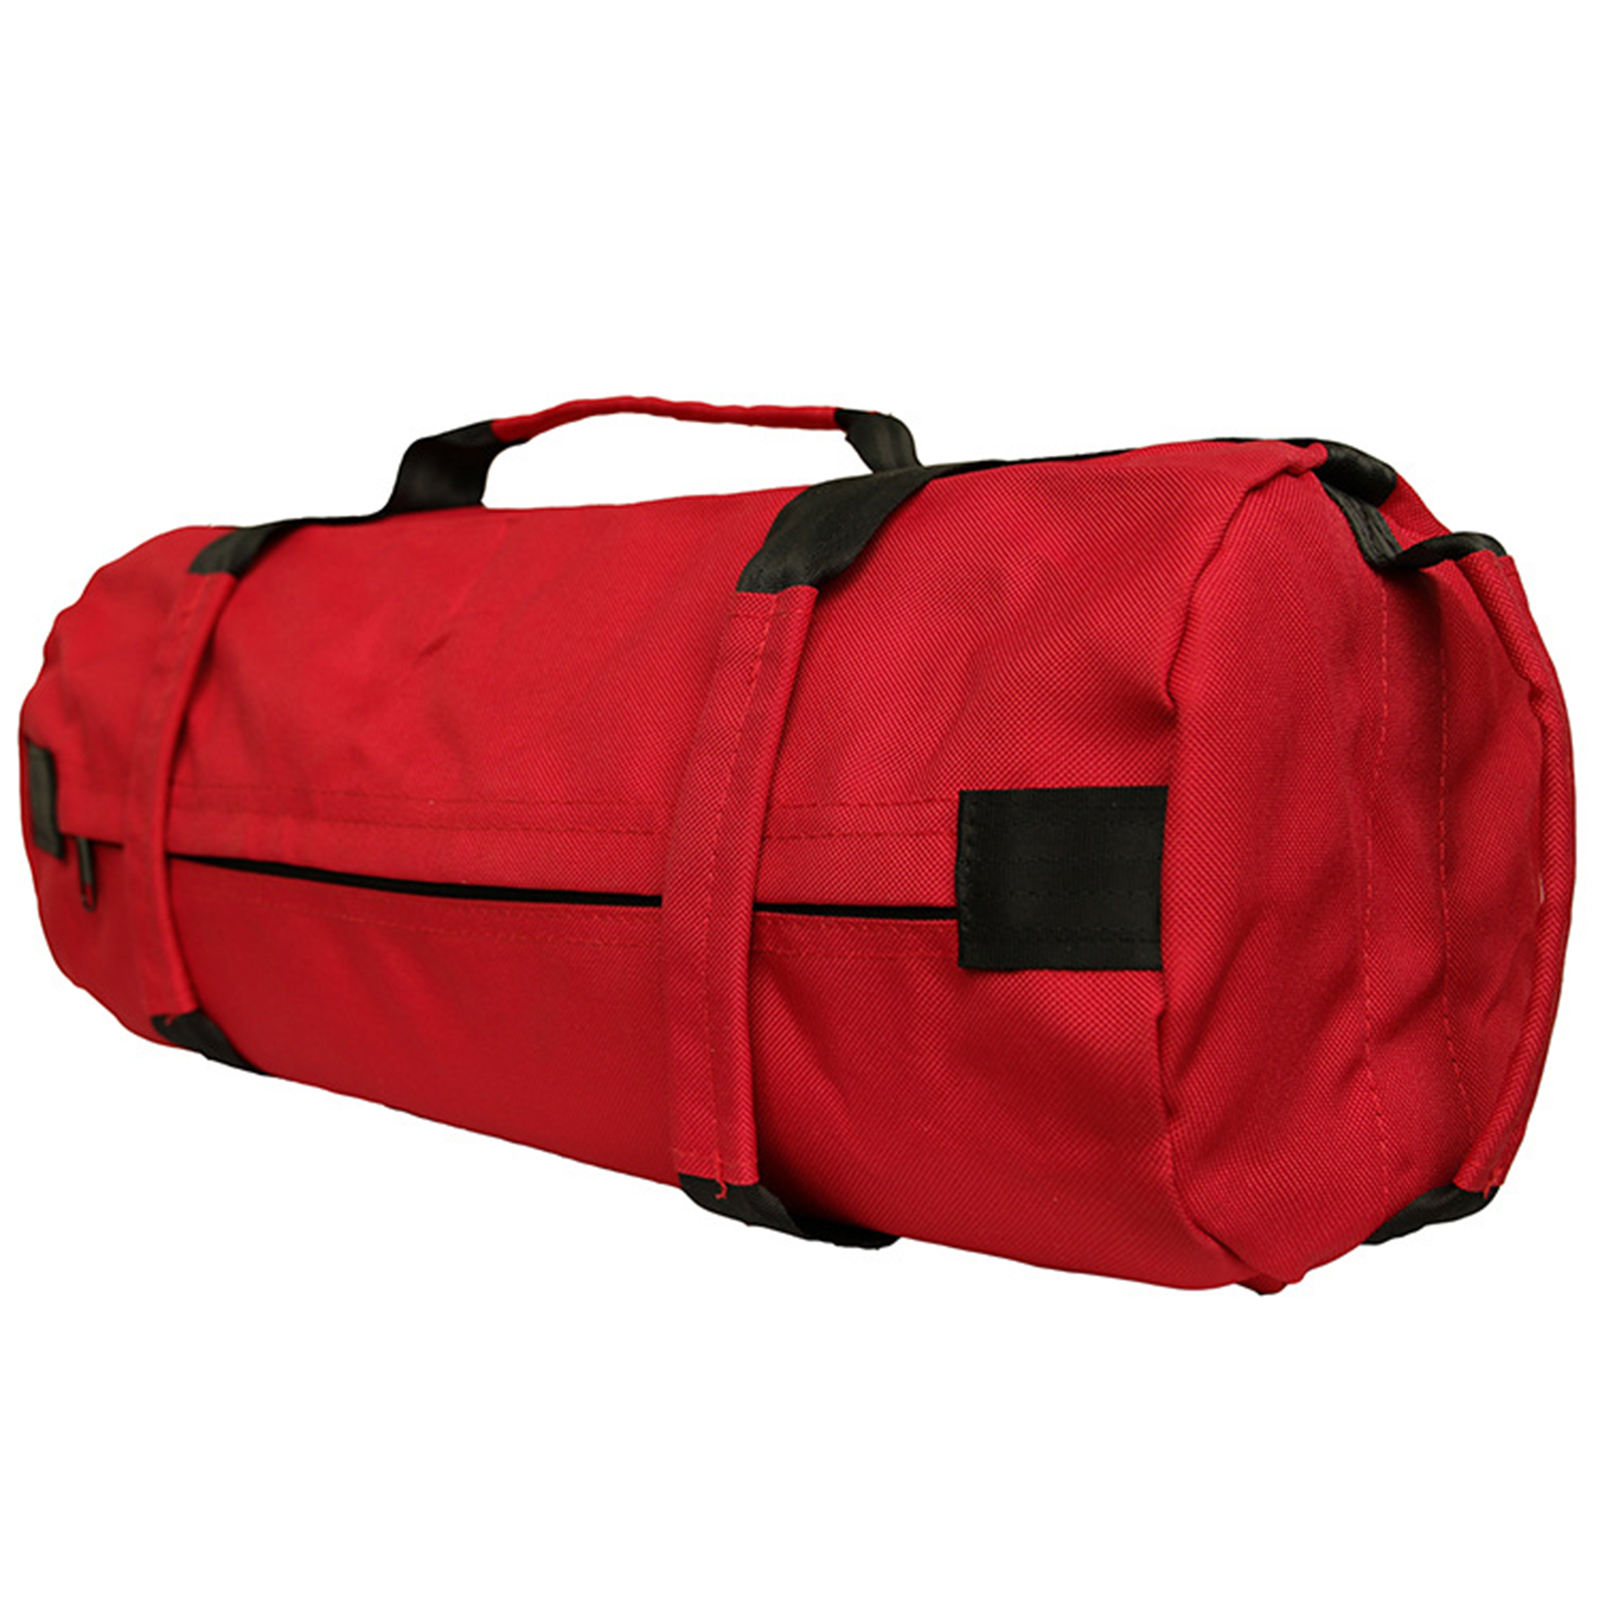 Fitness Weights Sandbag Exercise Workout Gym Sandbag for Training 20KG X4G3